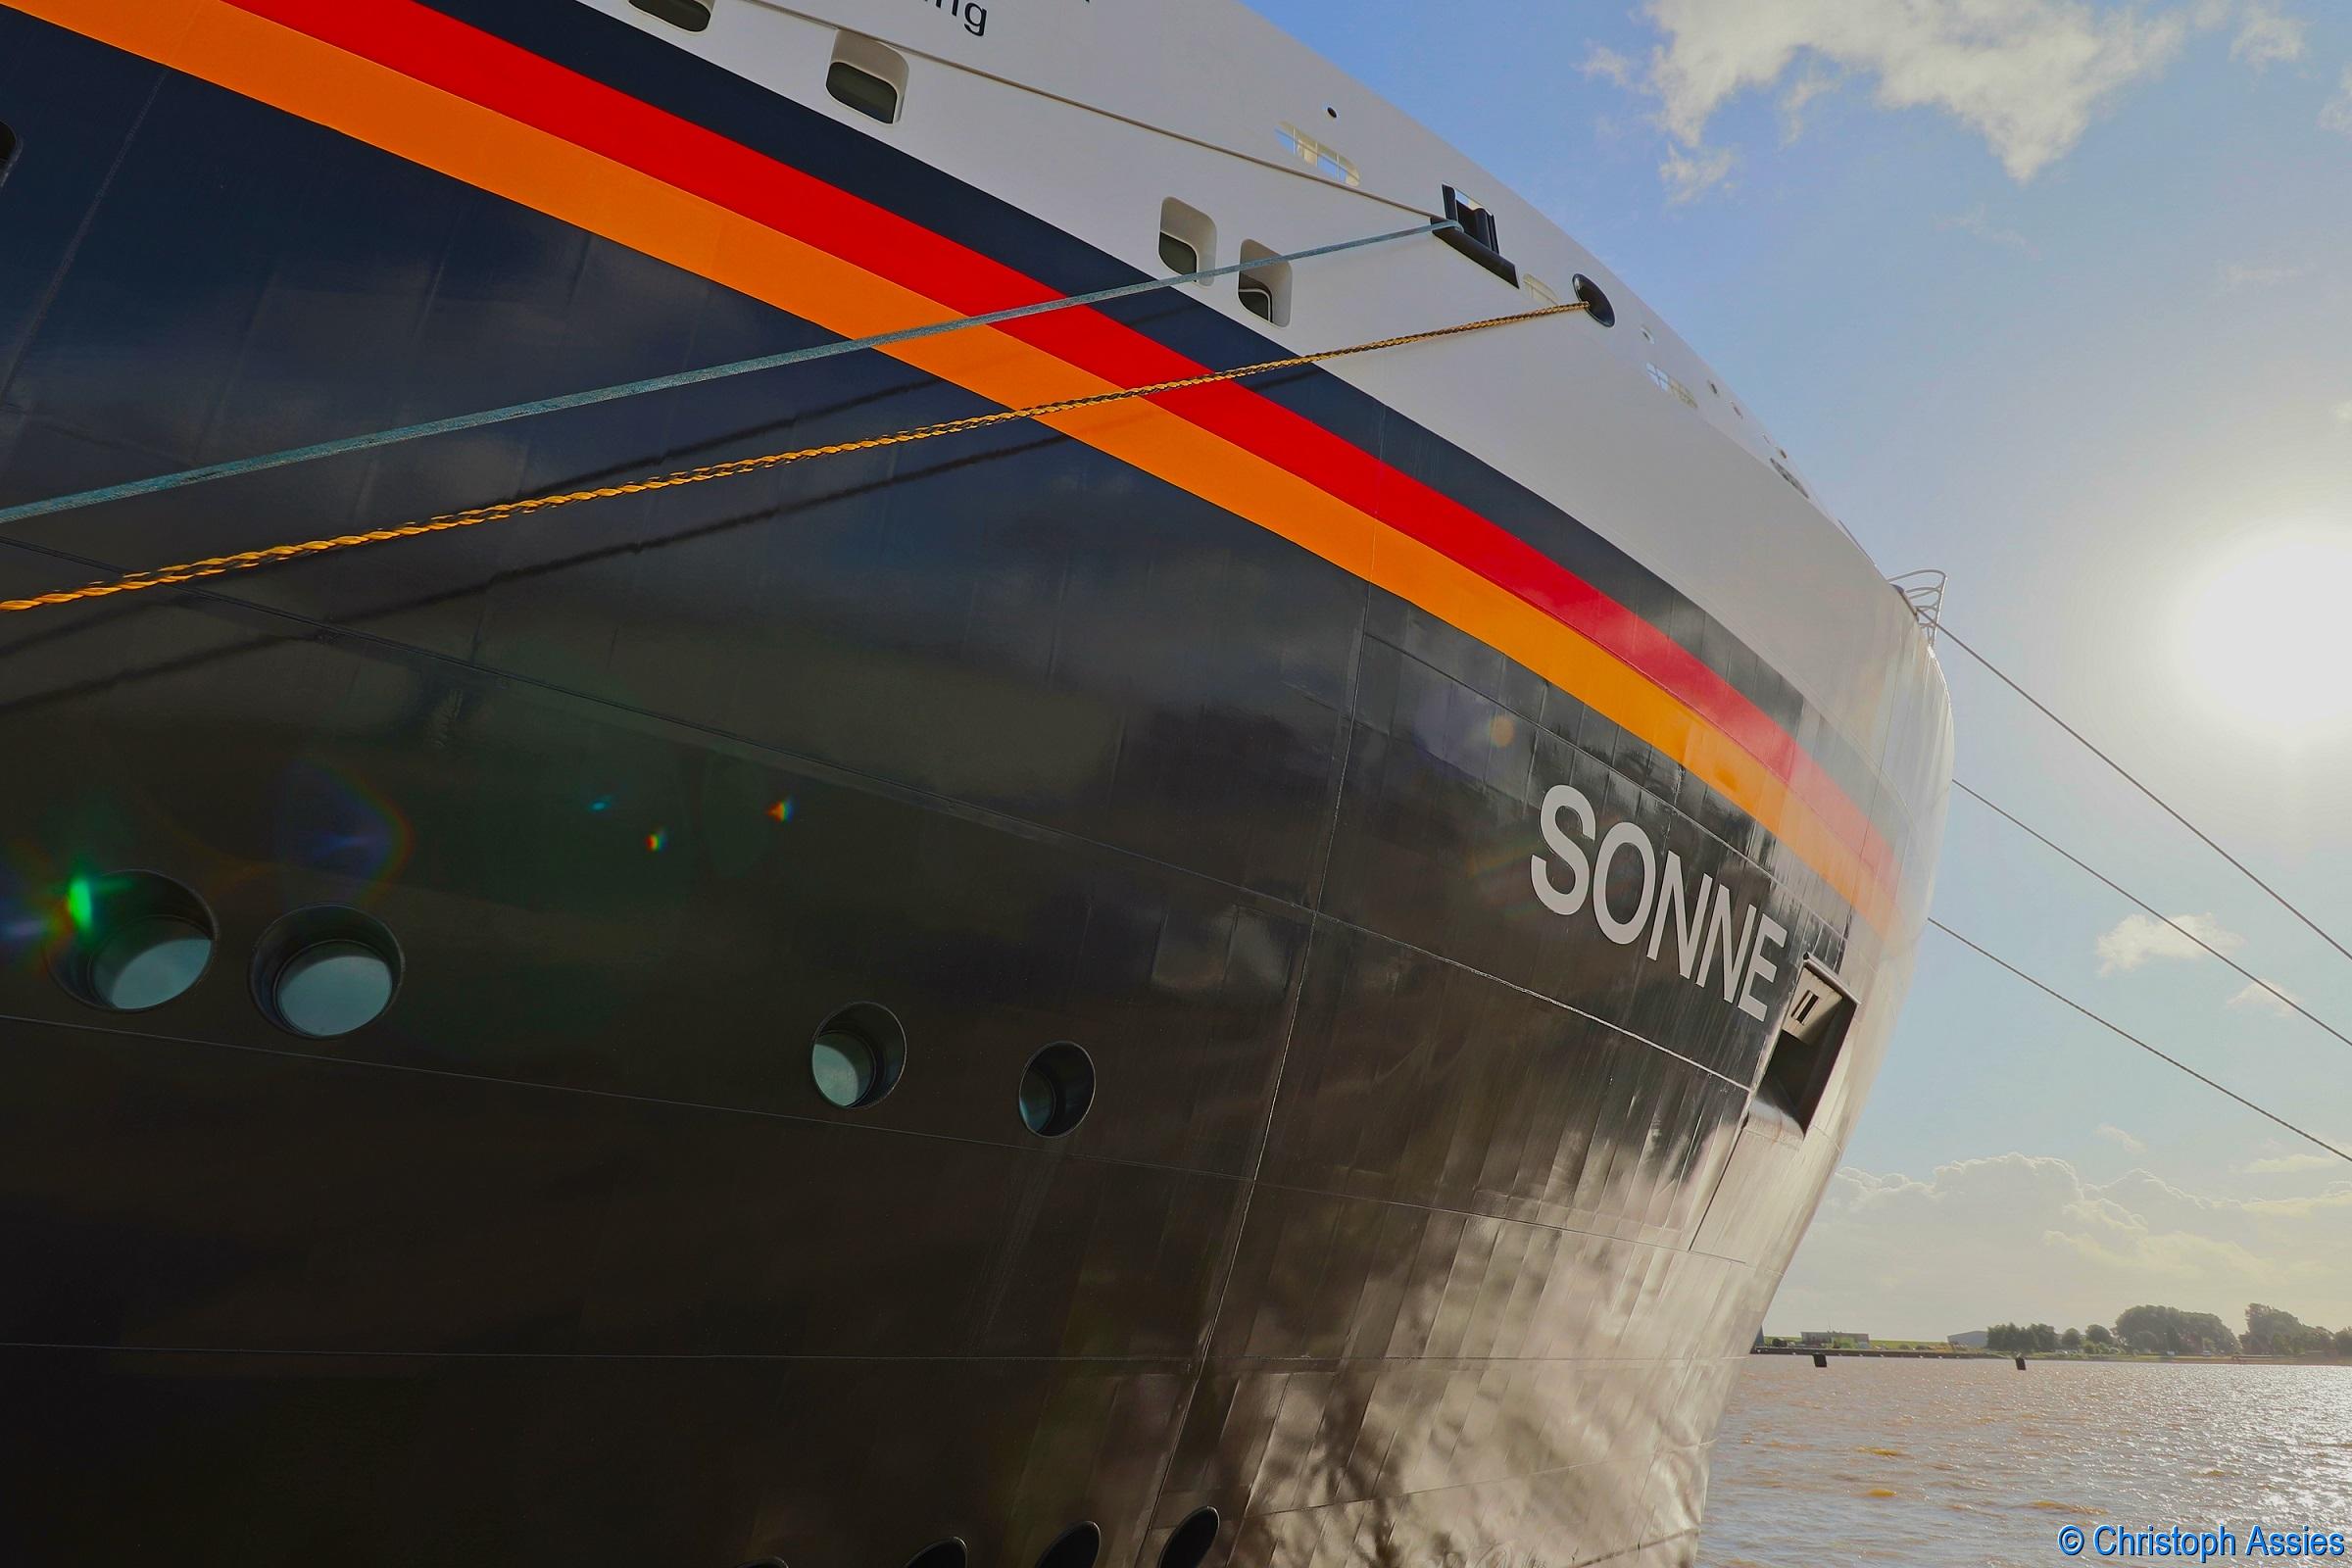 Forschungsschiff SONNE in Emden. Foto: Christoph Assies